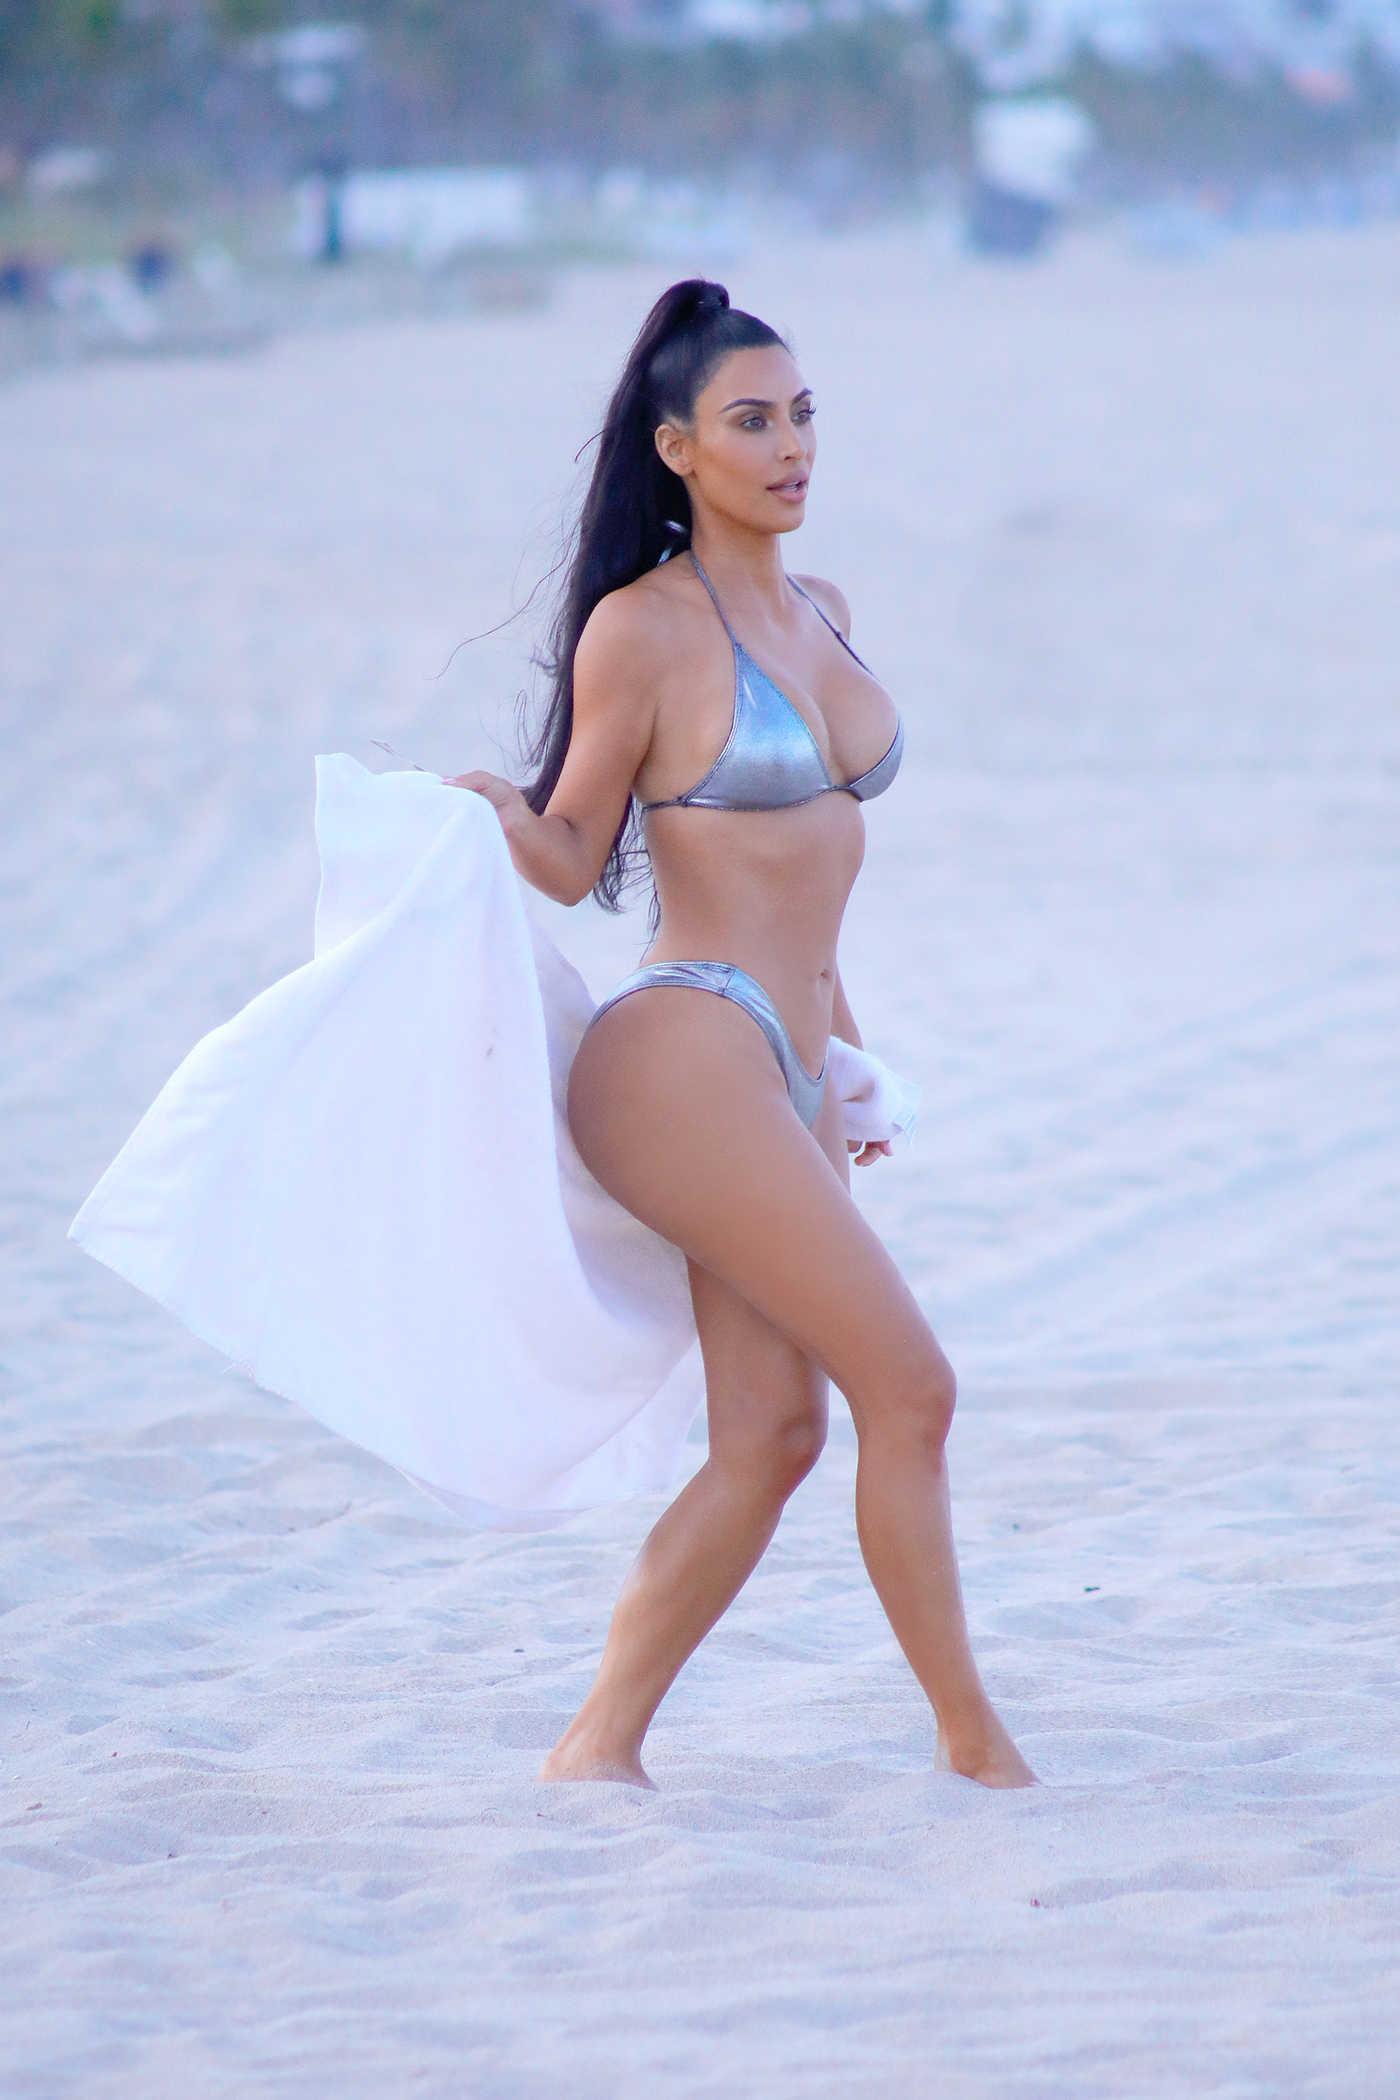 Kim Kardashian in a Silver Bikini During a Photoshoot in Miami 08/18/2018